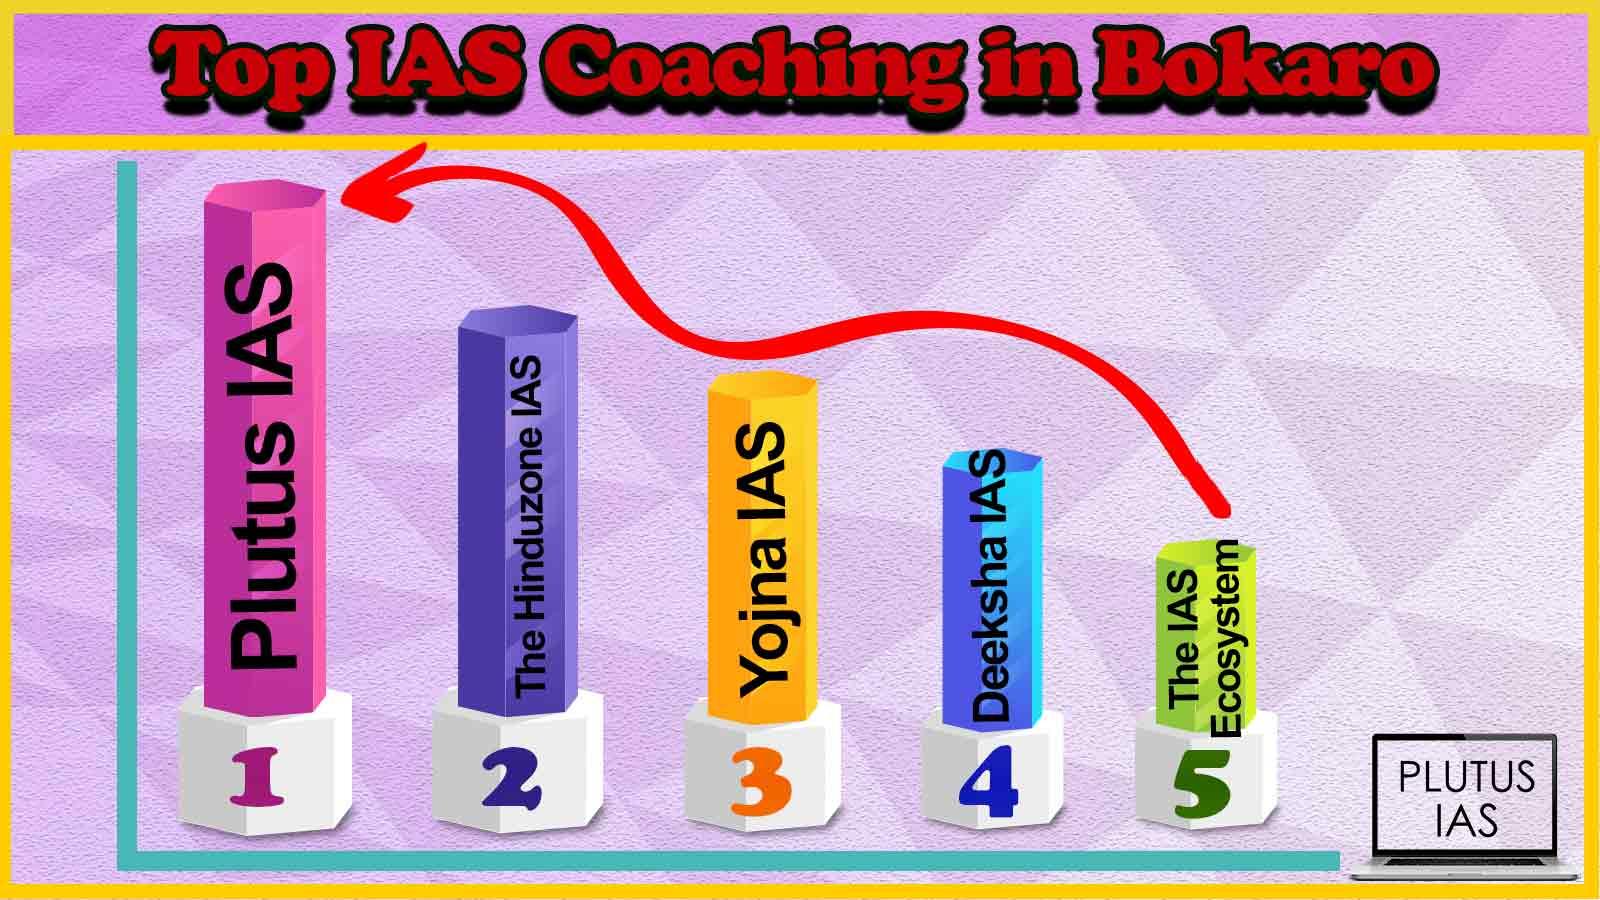 Best 10 IAS Coaching in Bokaro